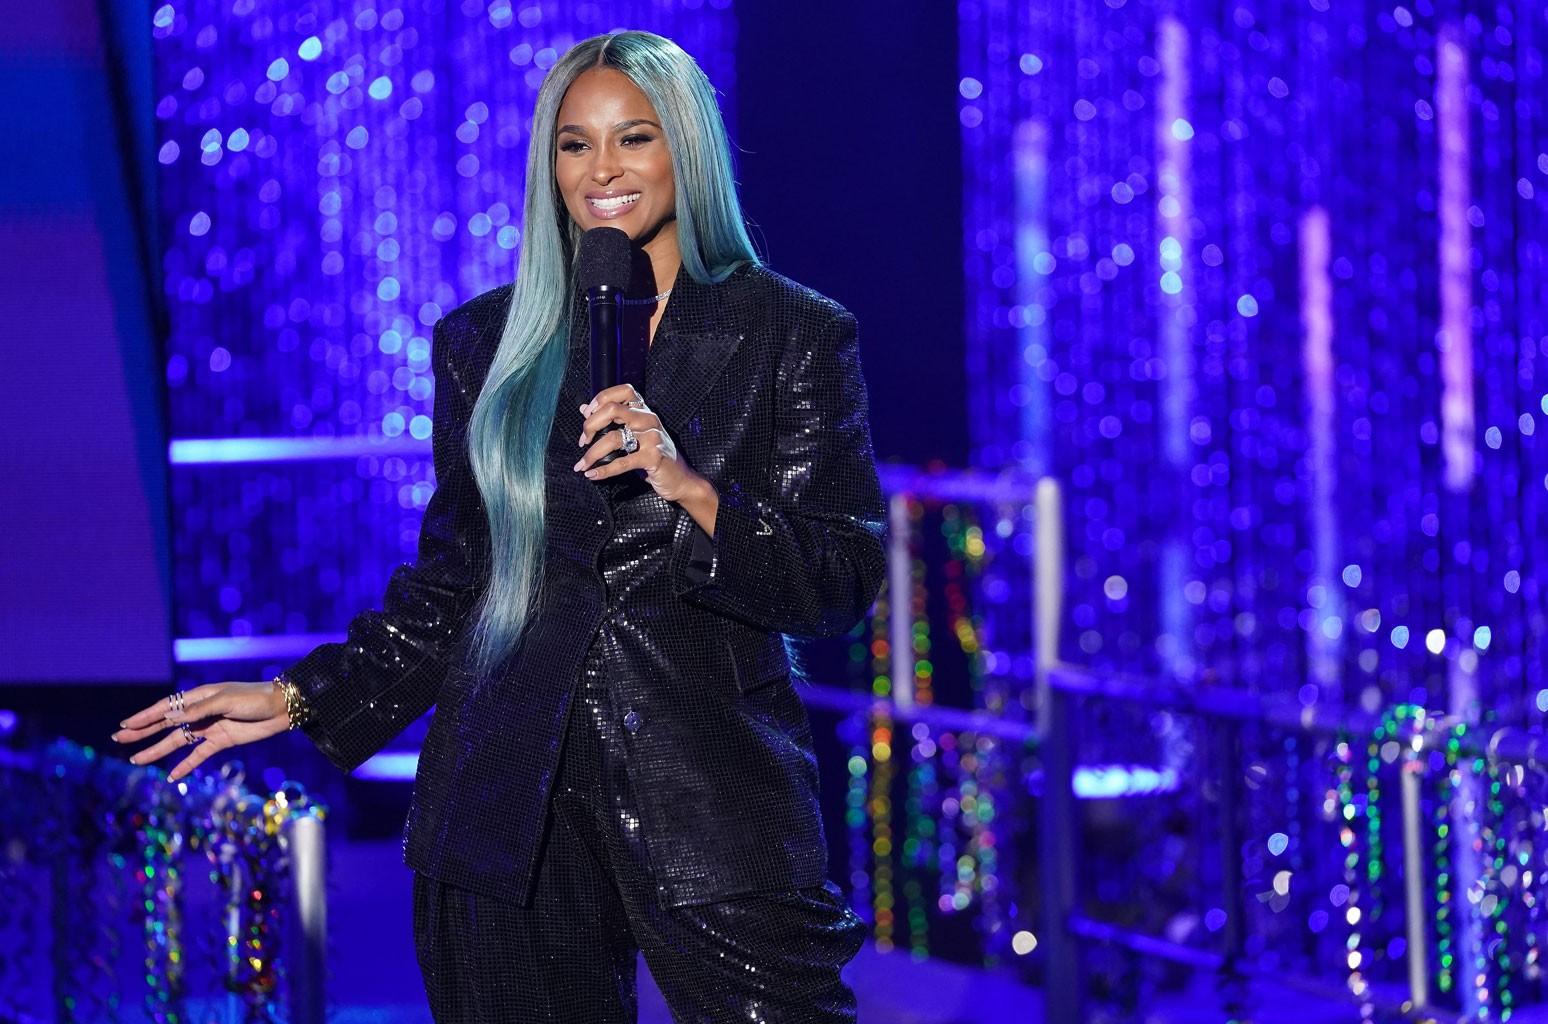 Ciara Scores First Top 10 on Hot Gospel Songs Chart With Tasha Cobbs Leonard Collab